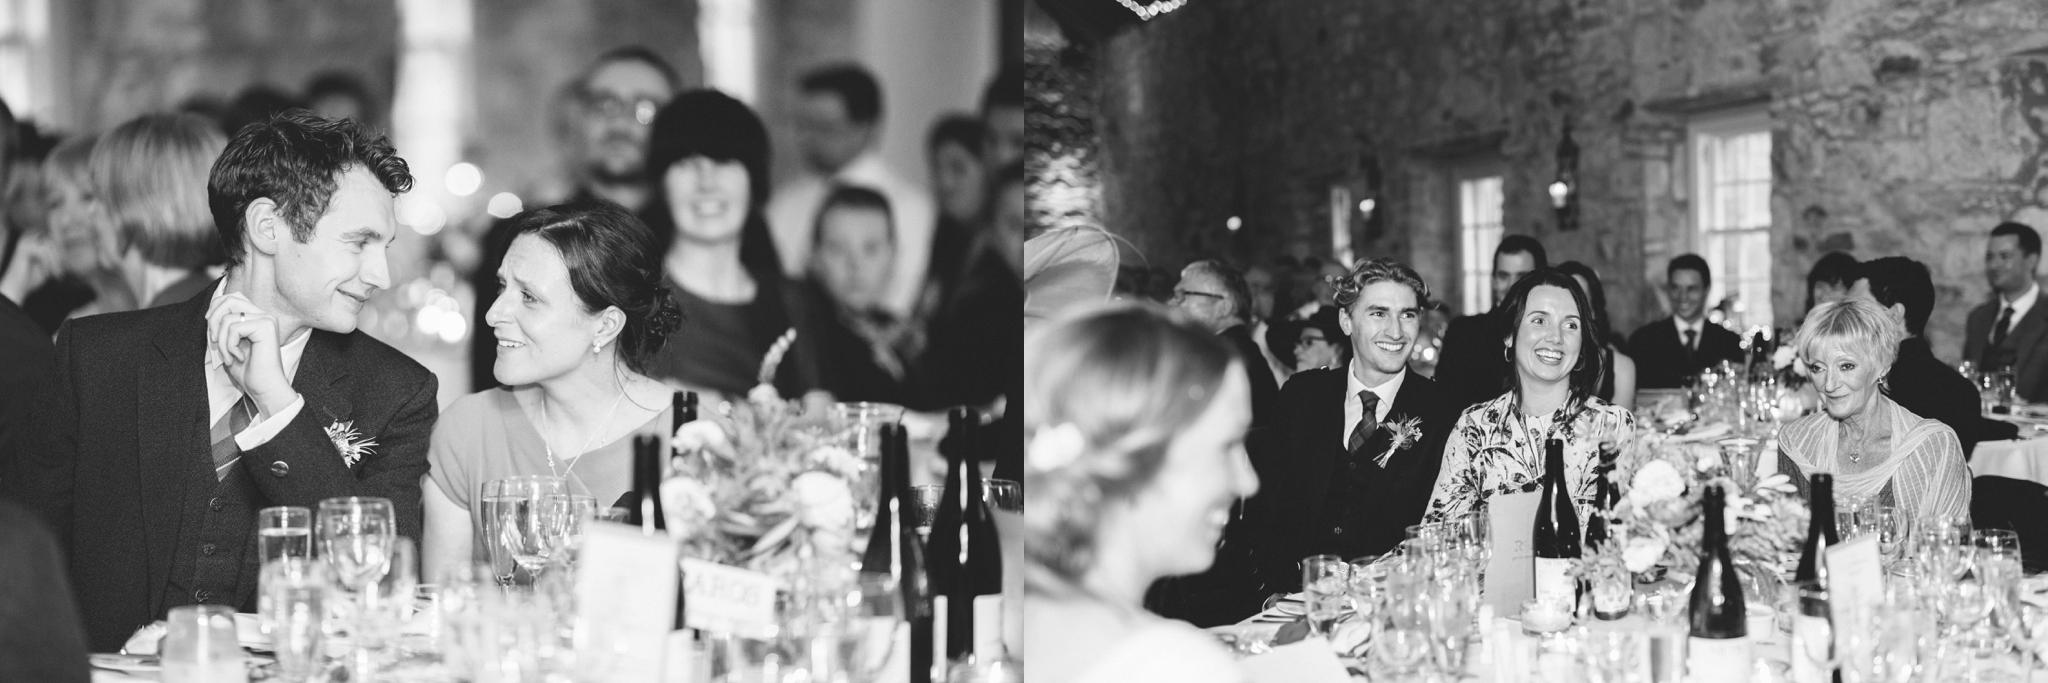 Suzanne_li_photography_kirknewton_wedding_0060.jpg